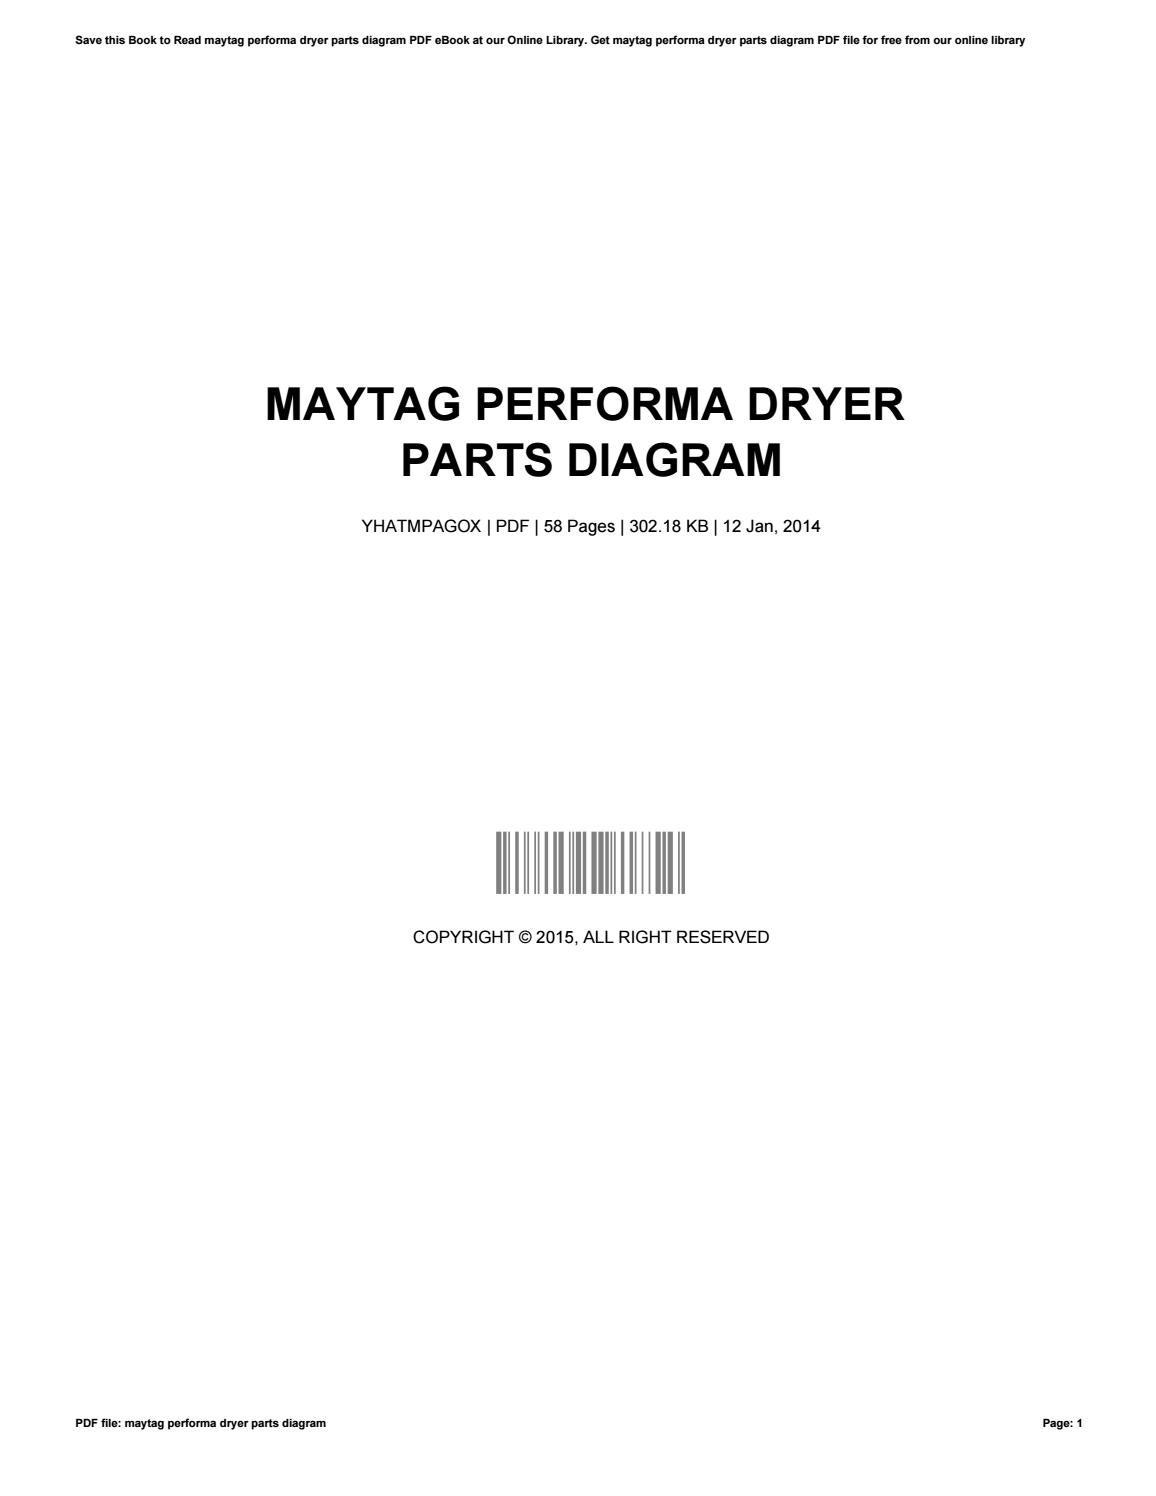 Maytag Performa Dryer Parts Diagram By Bradleygannaway1966